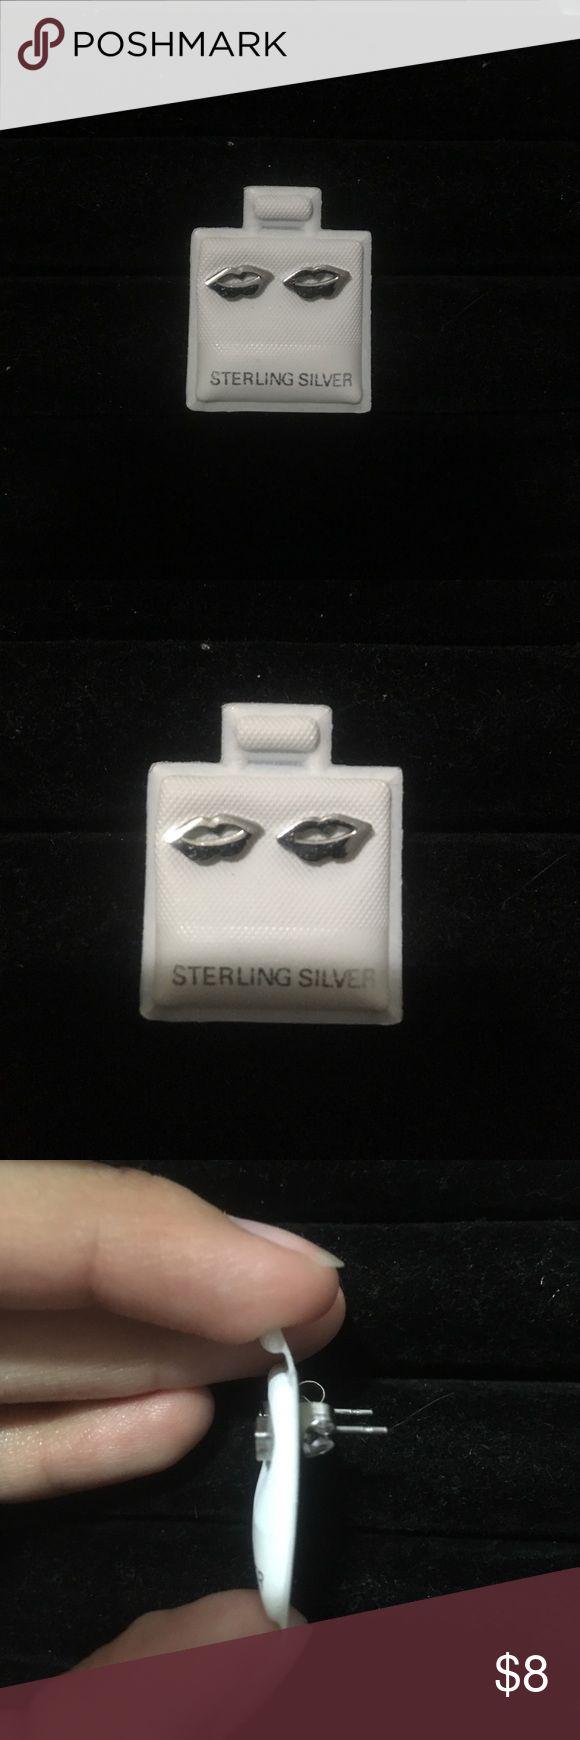 Lips studs Stainless steel! New!😊💕 Jewelry Earrings